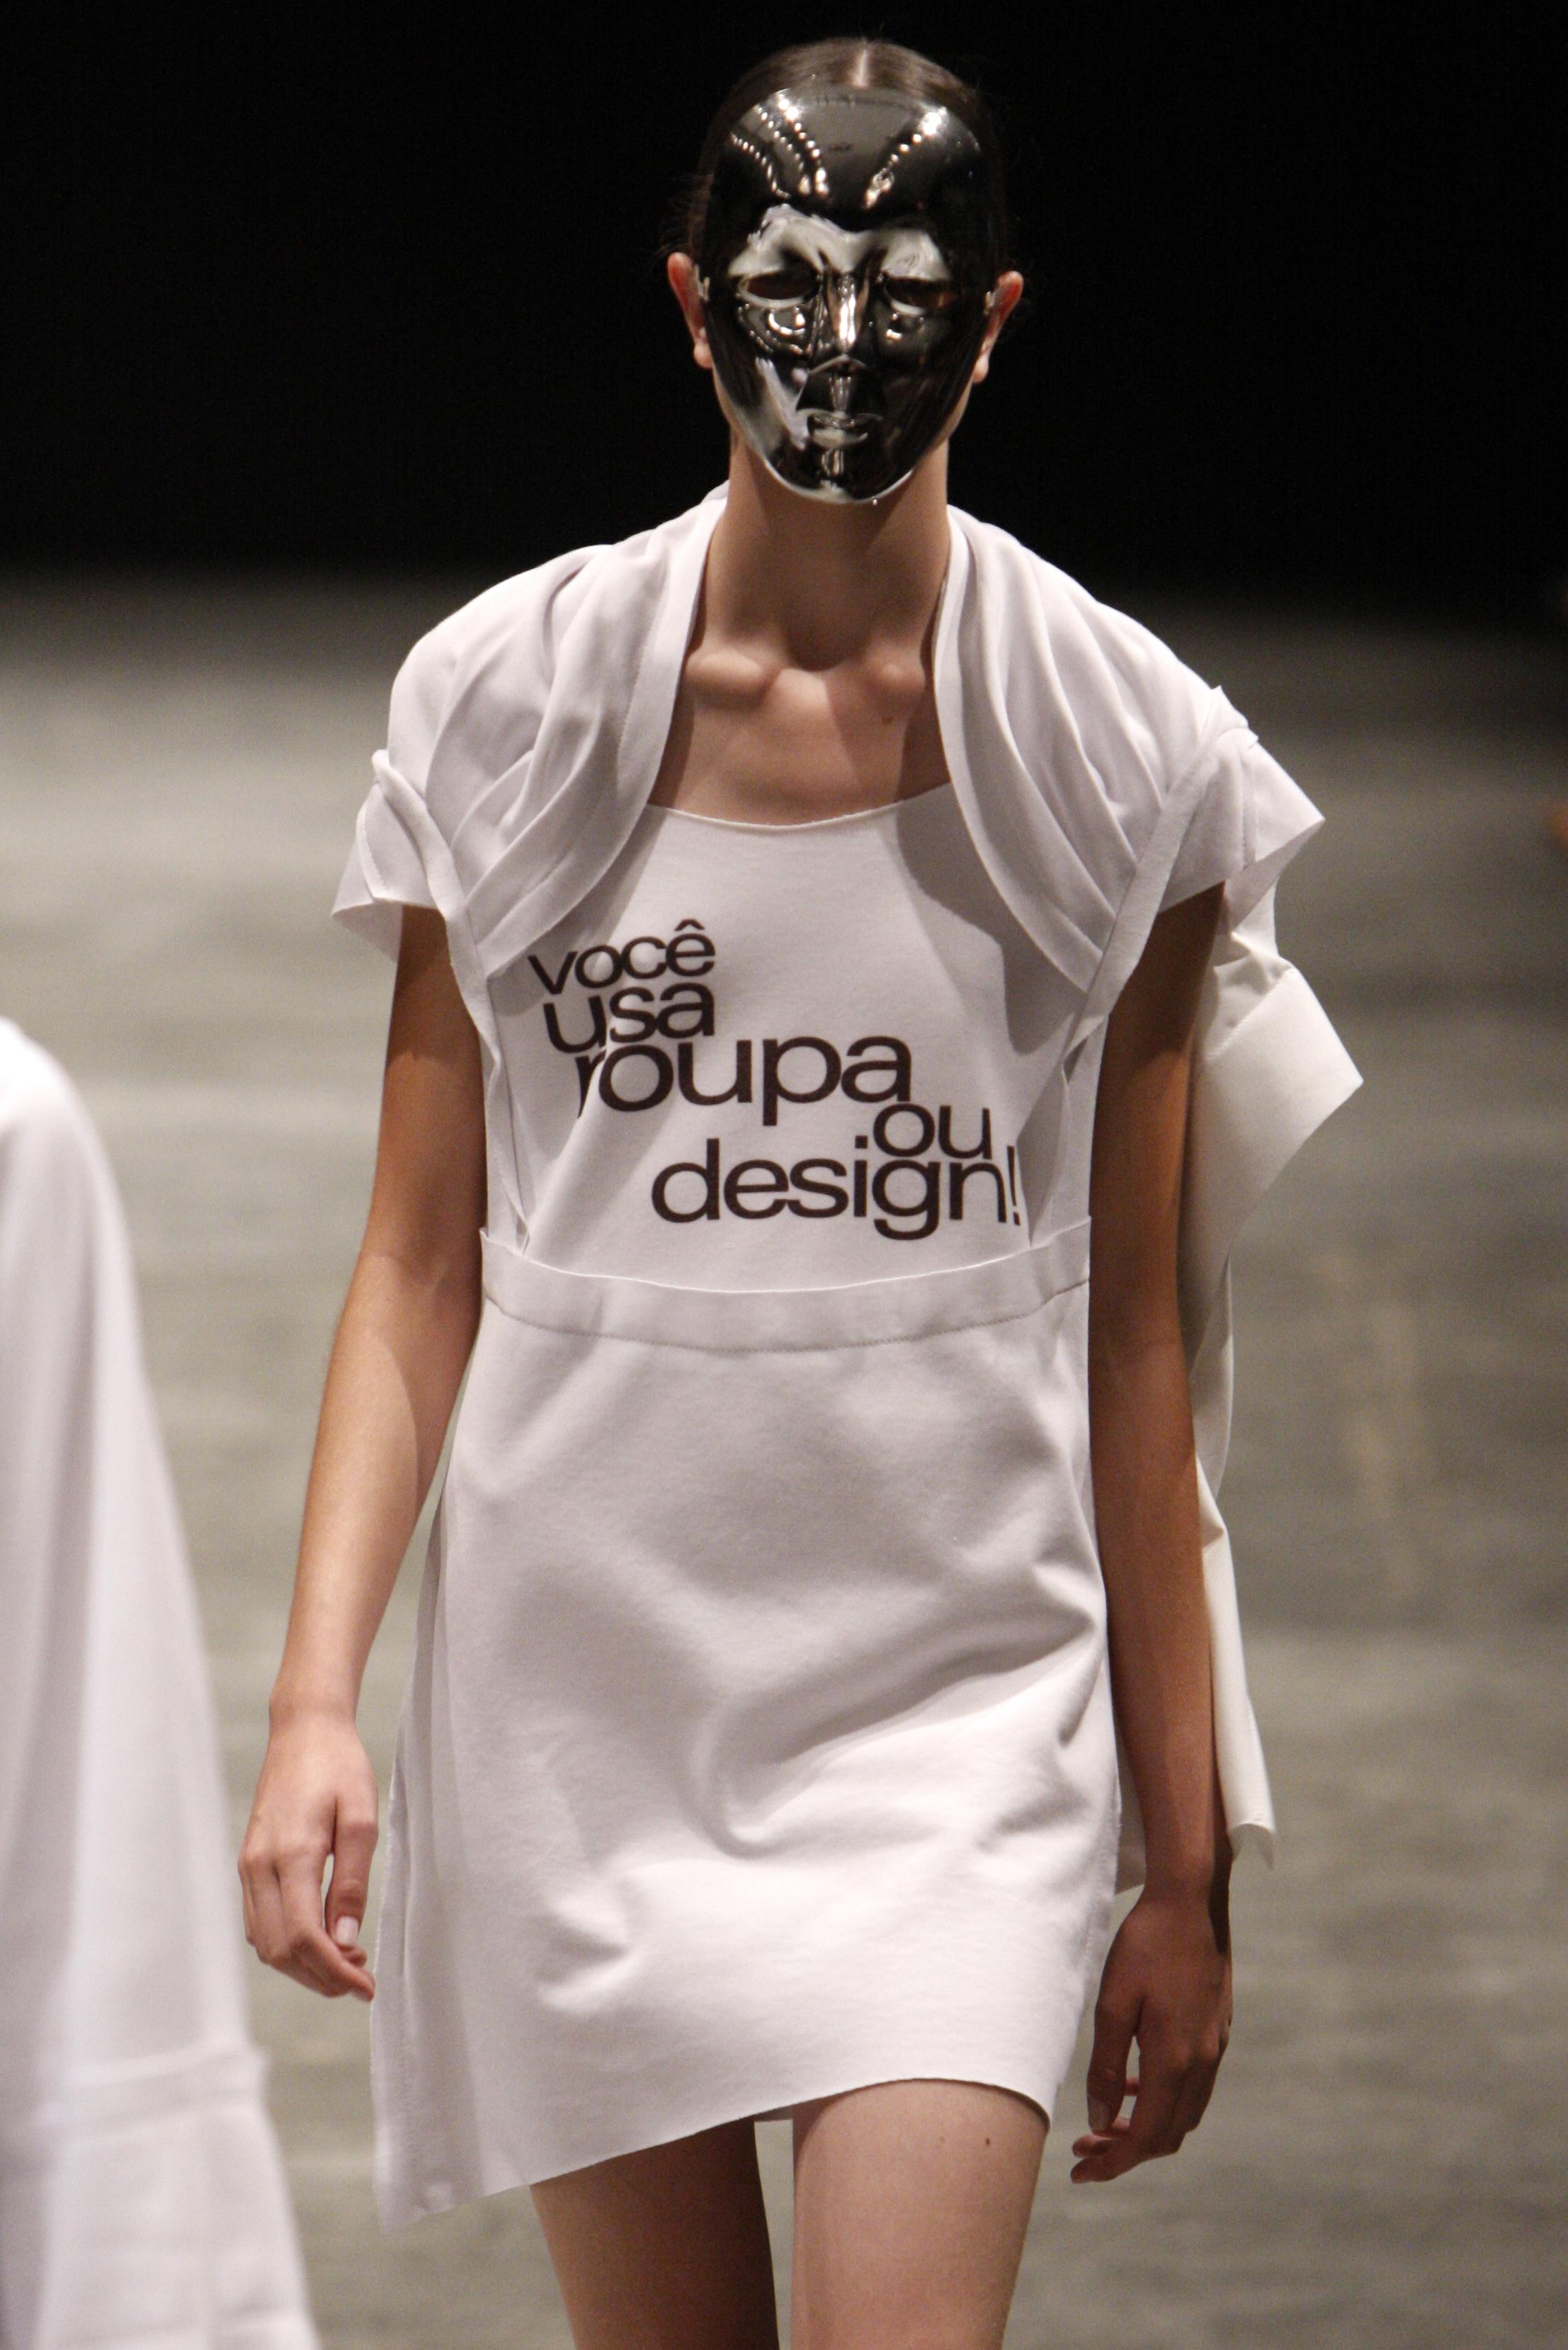 Roupa ou design